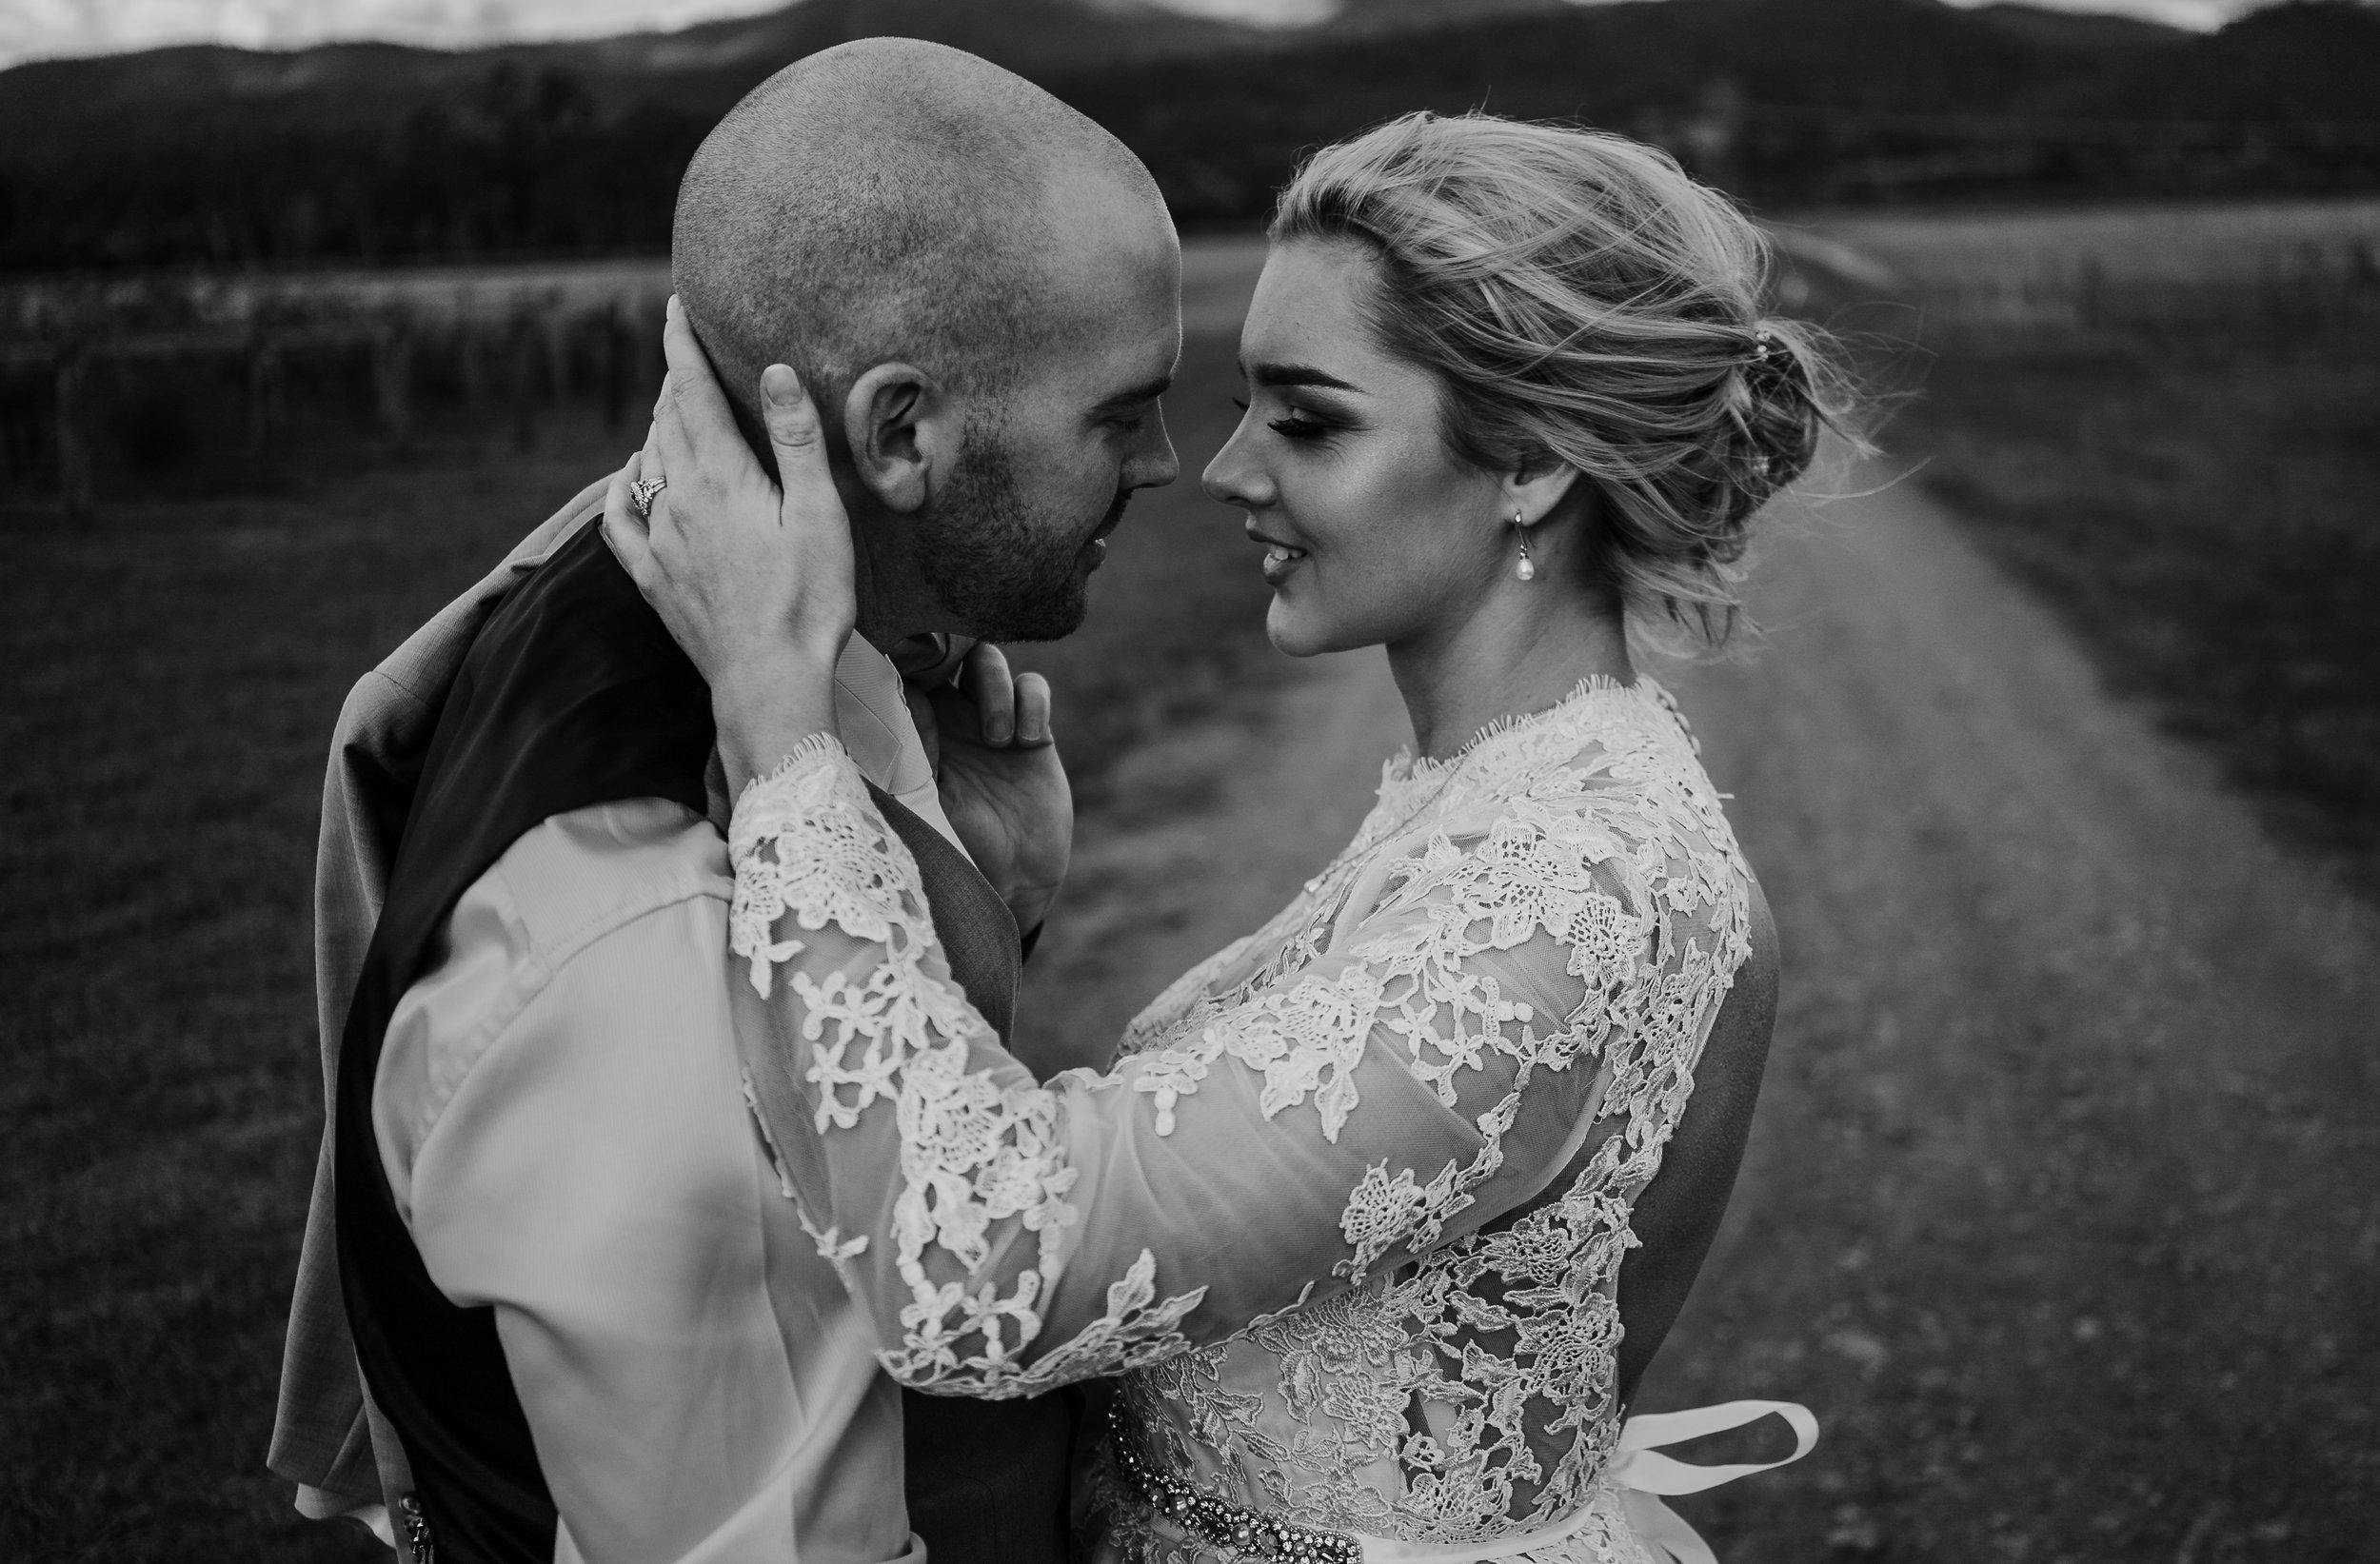 mickalathomas_puremacphotography_weddingphotographer_couplephotographer_Sheppartonphotographer_1486.jpg